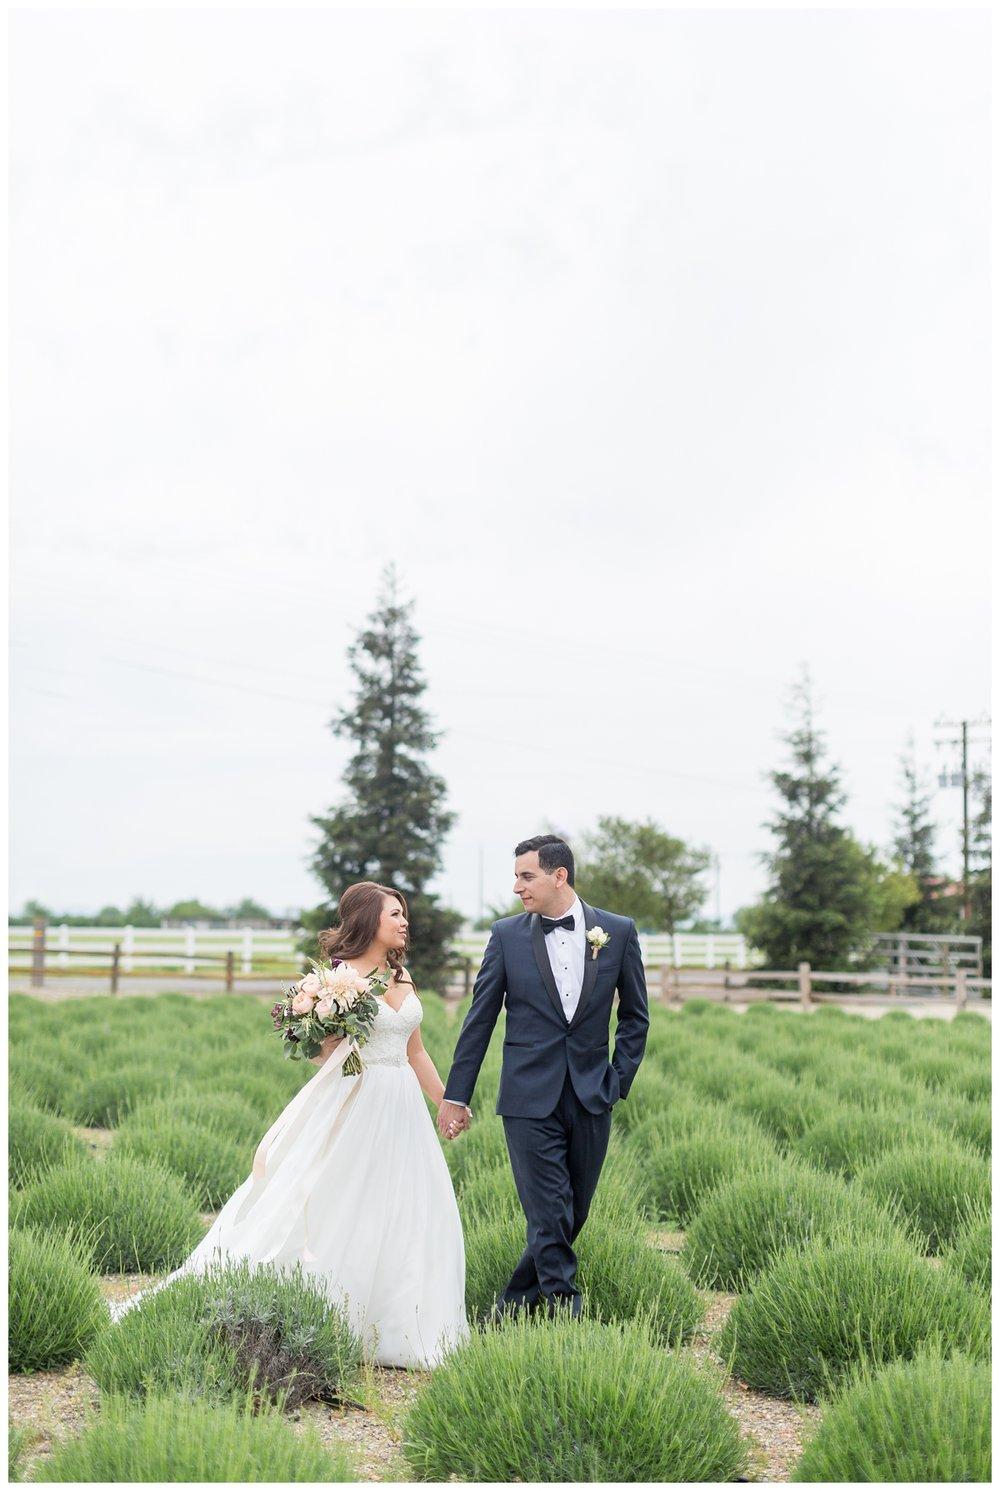 Pageo-Lavender-Farms-Wedding-Photos_4716.jpg